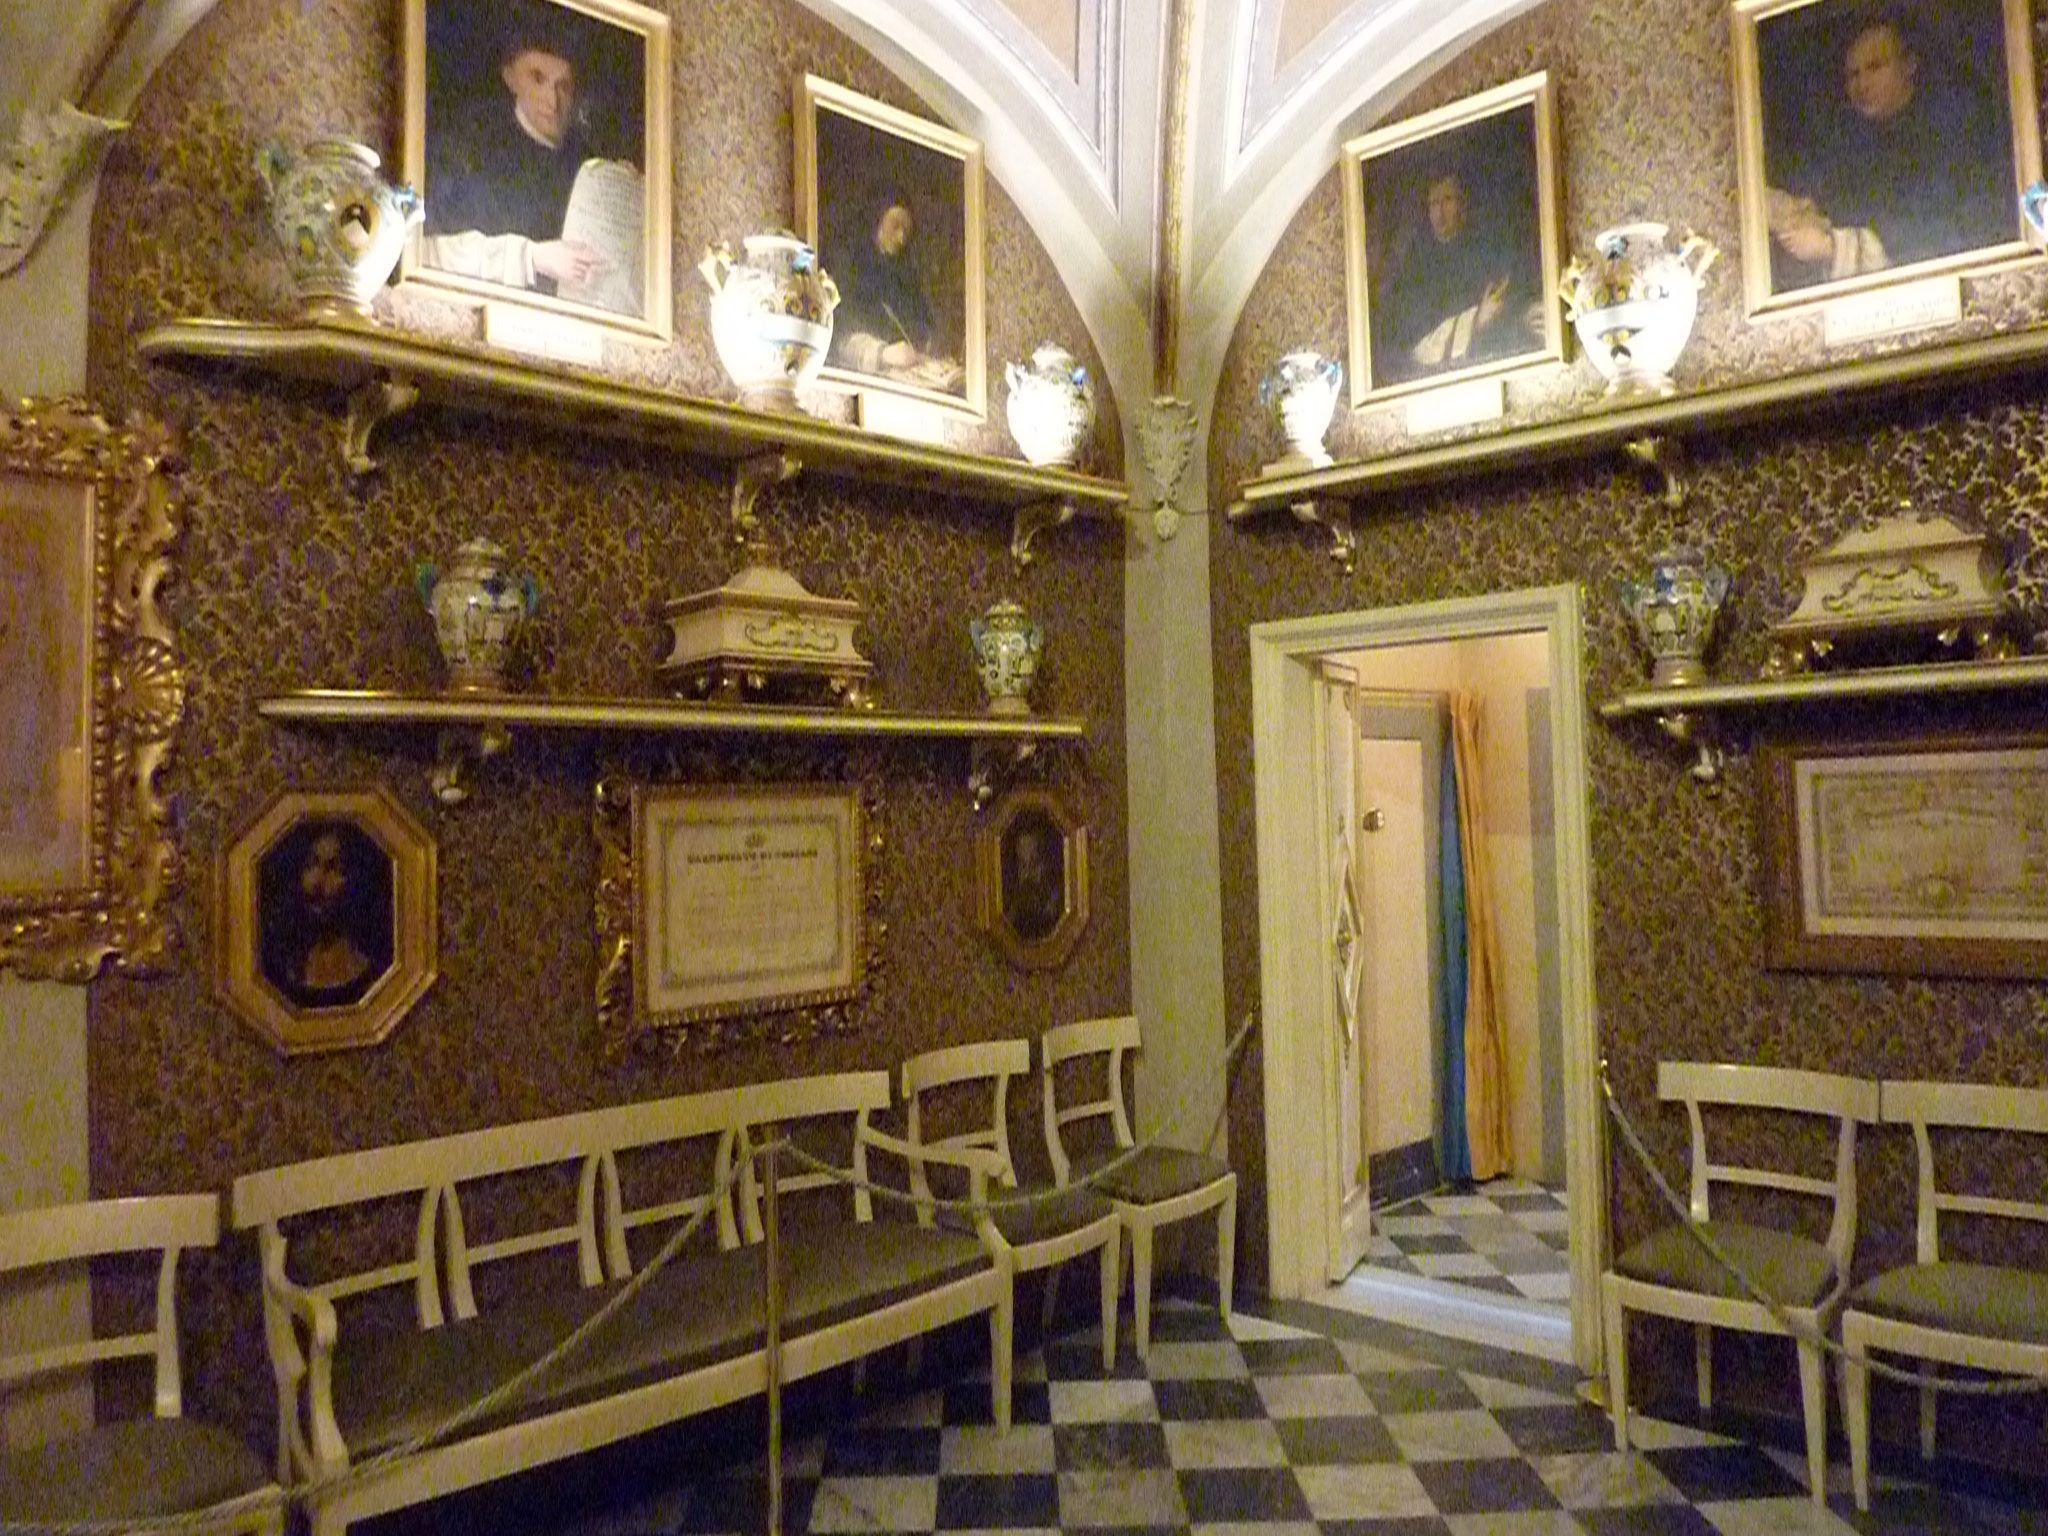 Salle musée 2 - Pharmacie Novella - Florence